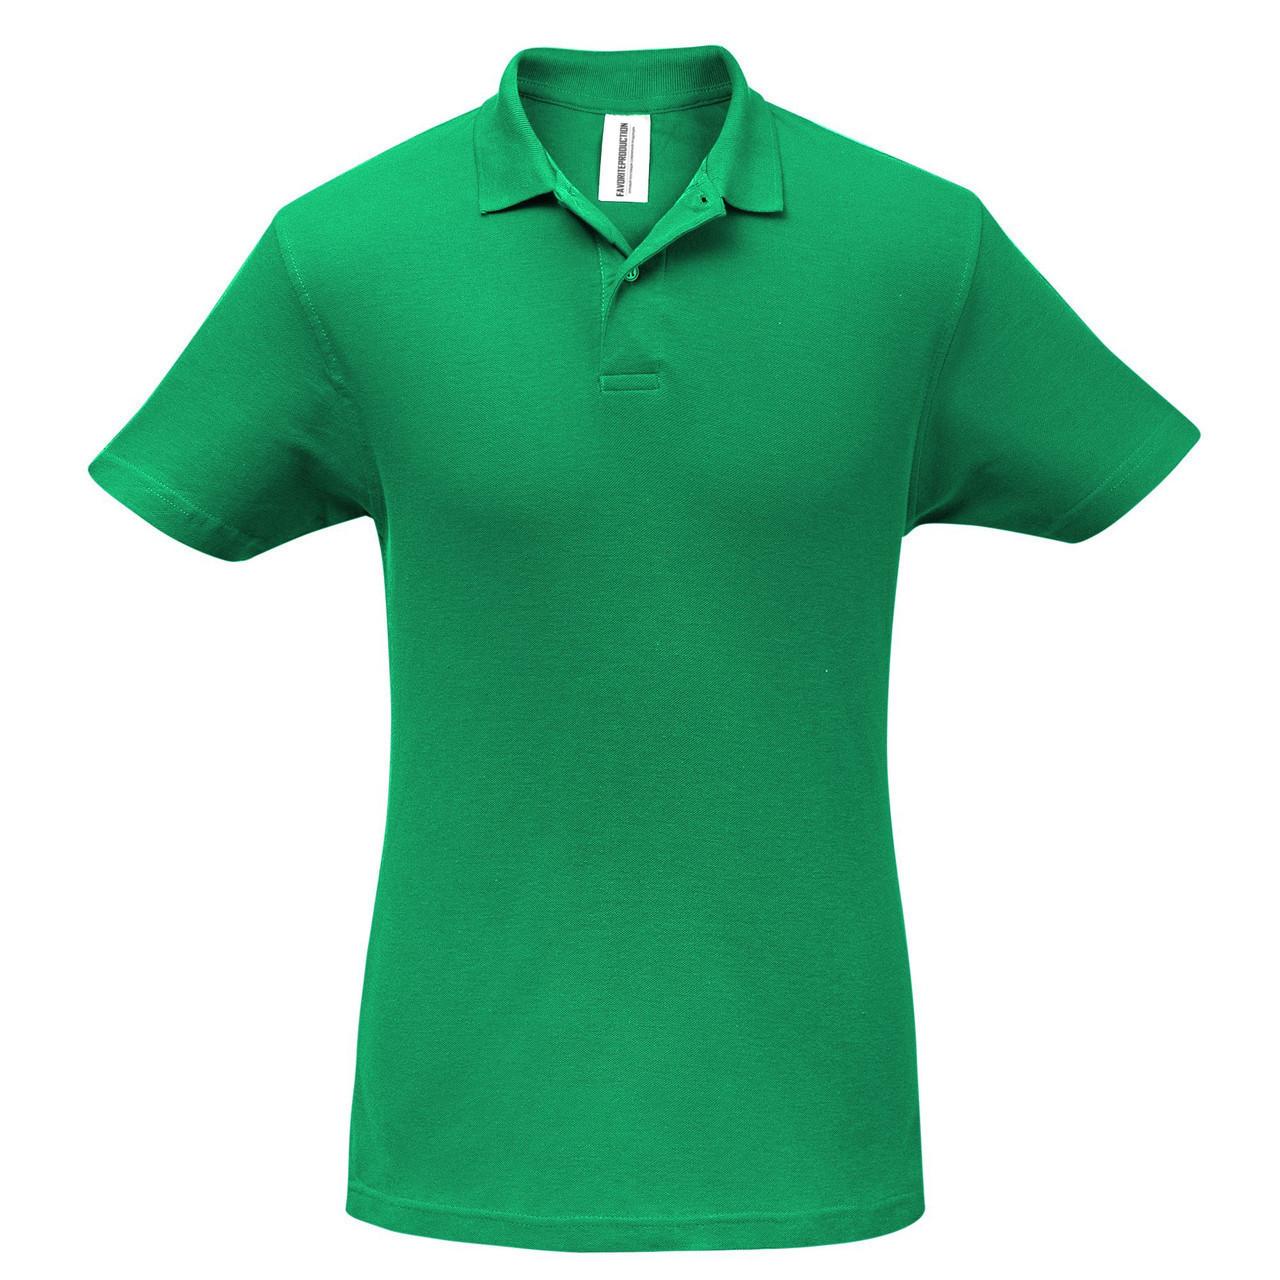 Футболка Поло Зеленая.200 гр.3XL